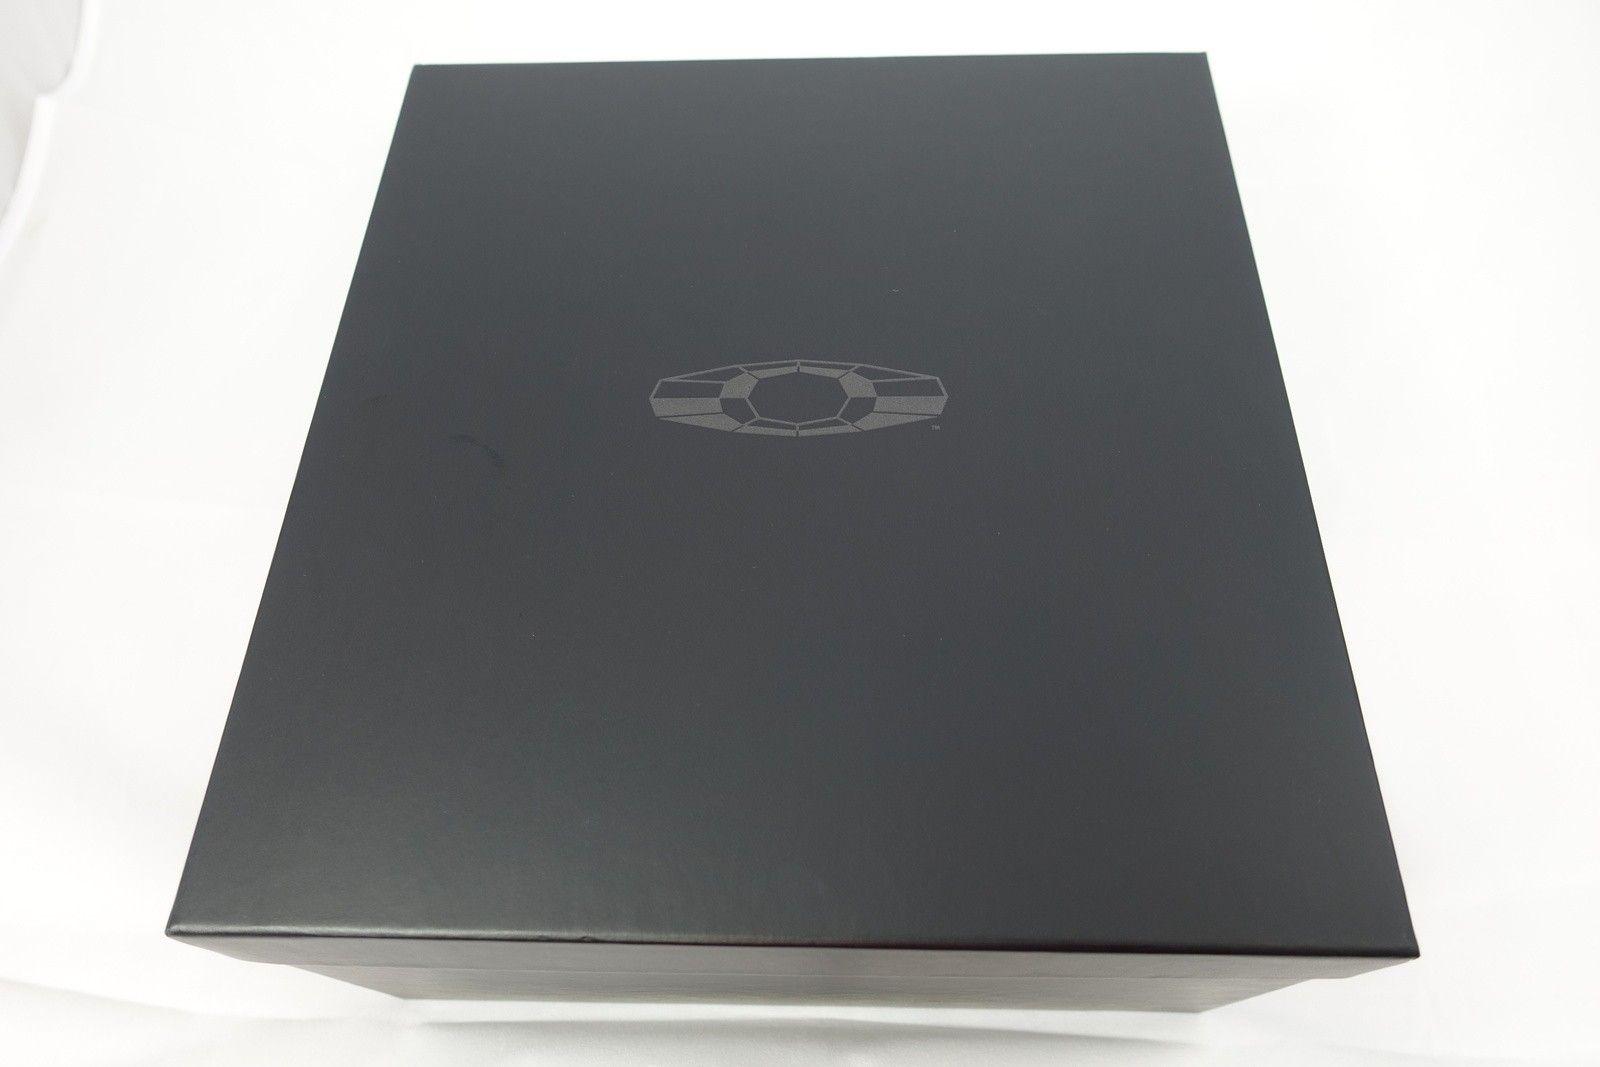 C-Six Aluminum #1116 BNIB - DSC02279.JPG